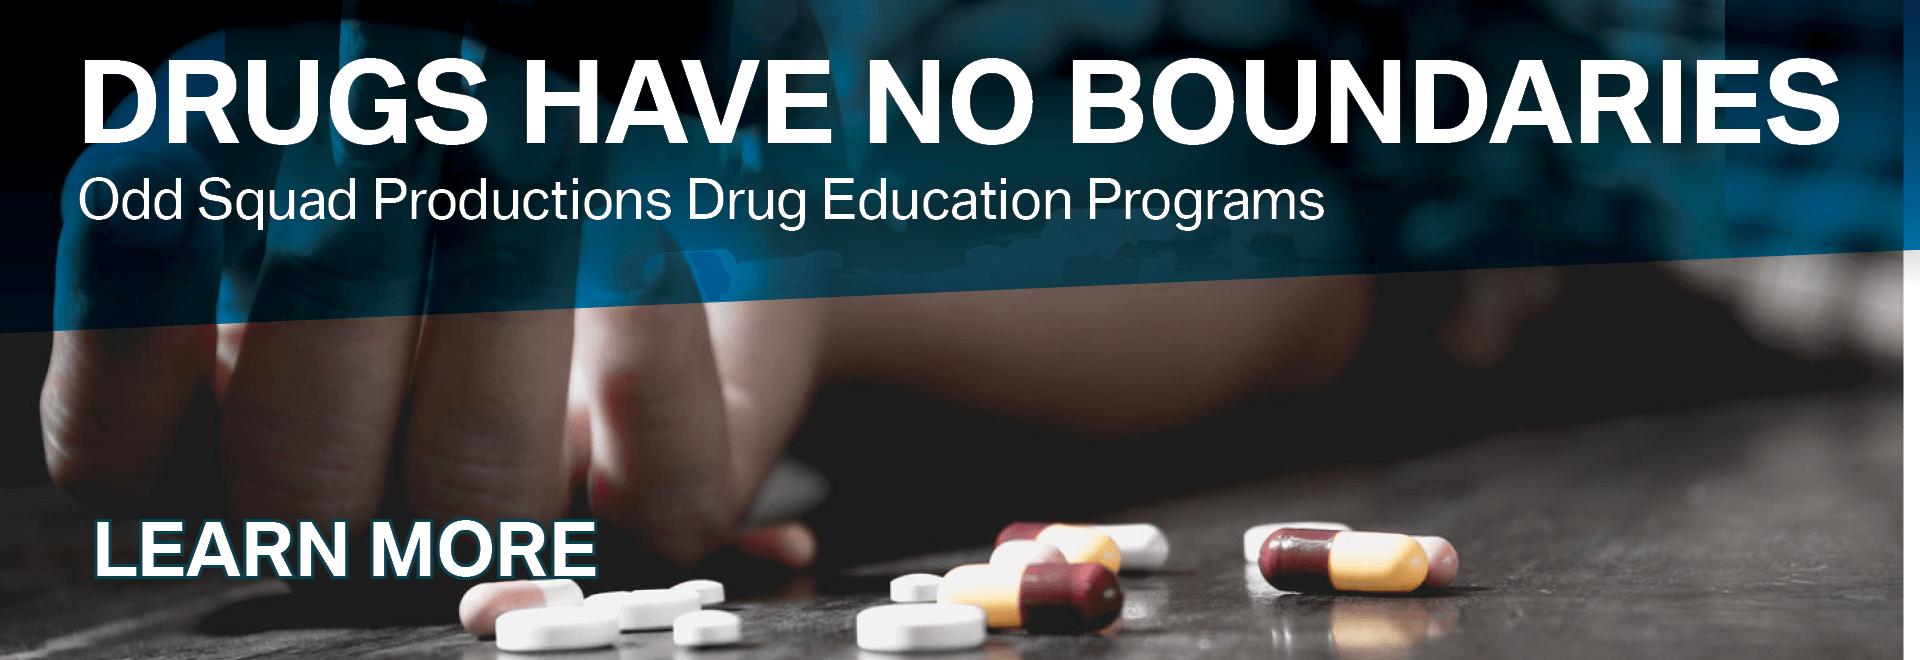 Drug Education - Odd Squad